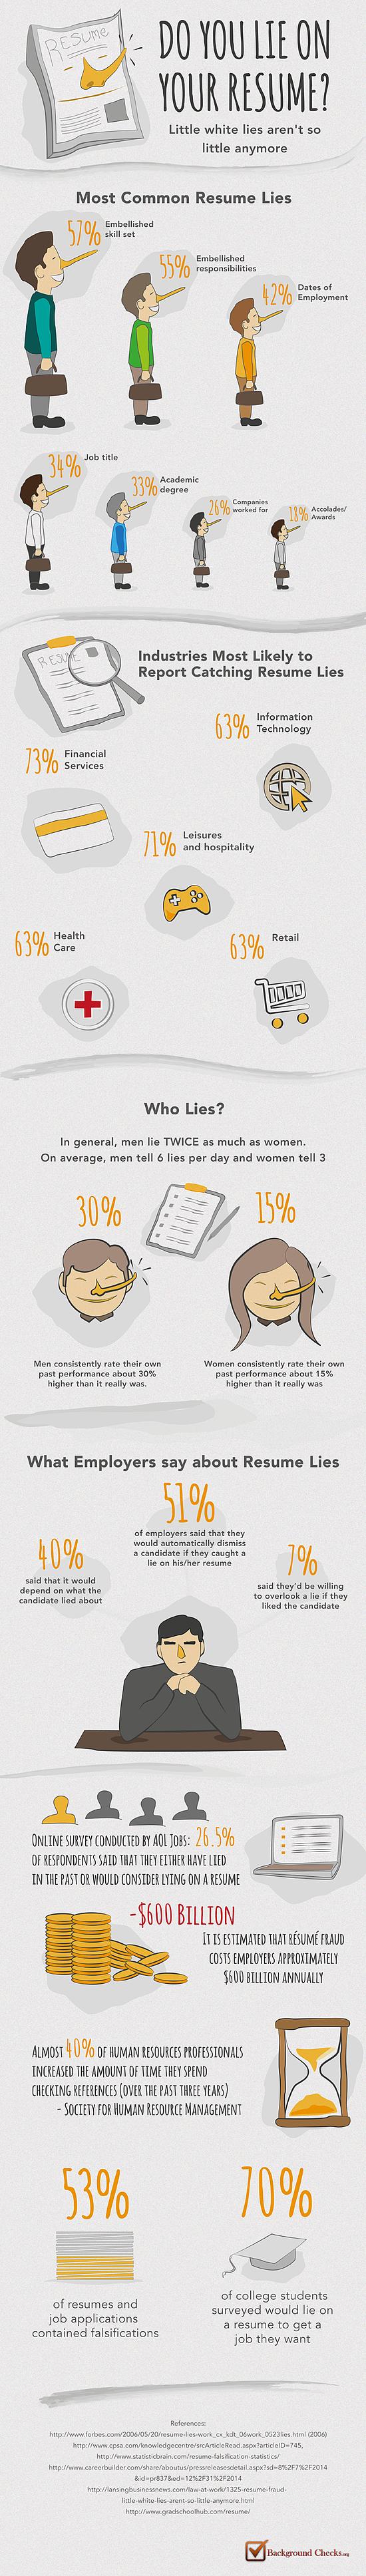 Resume Lie Statistics